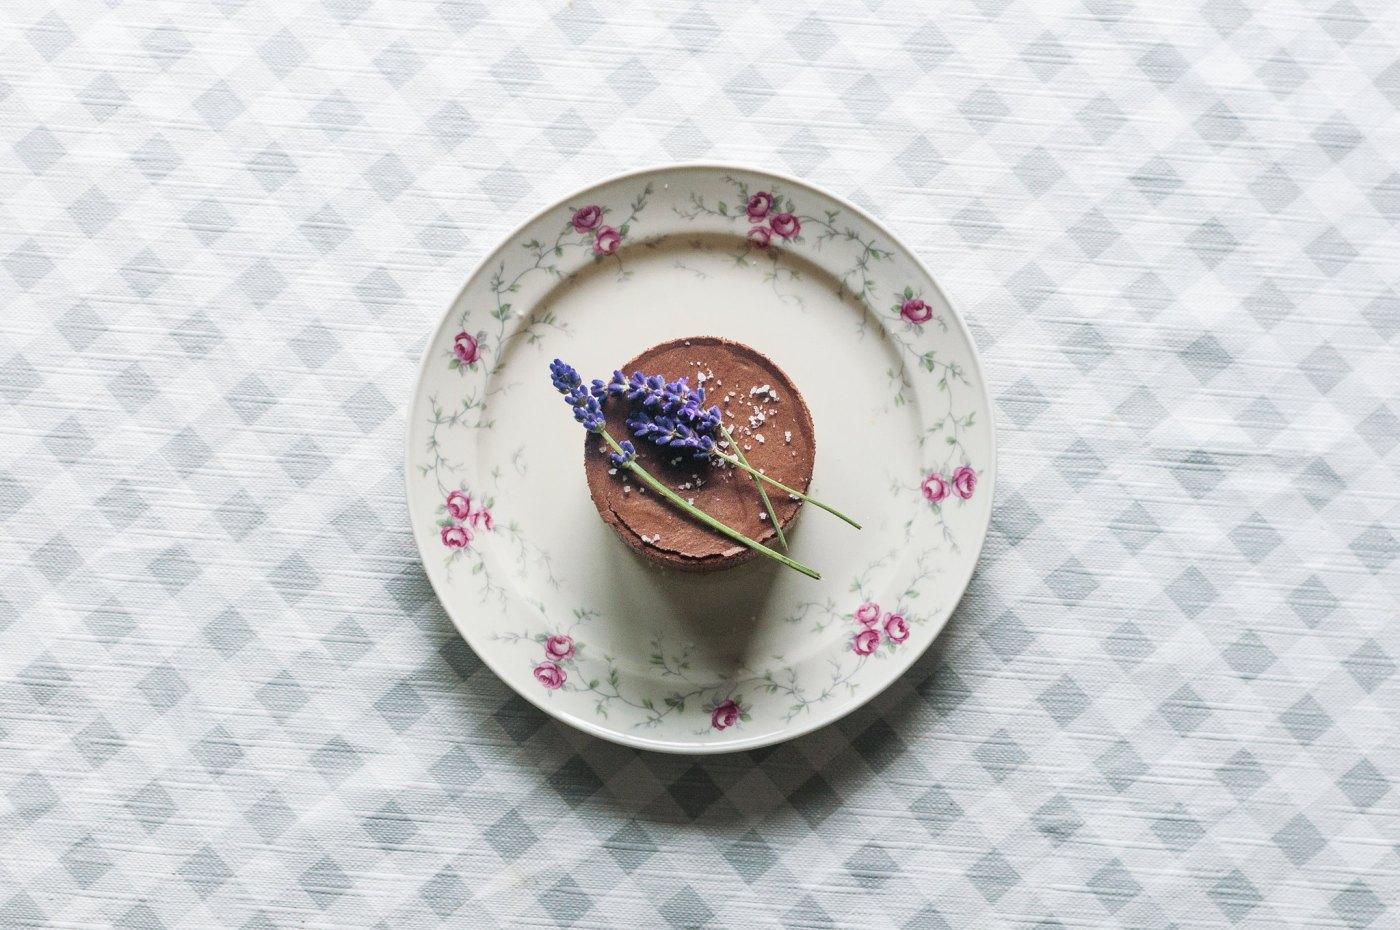 dark chocolate lavender mousse on olive oil cake